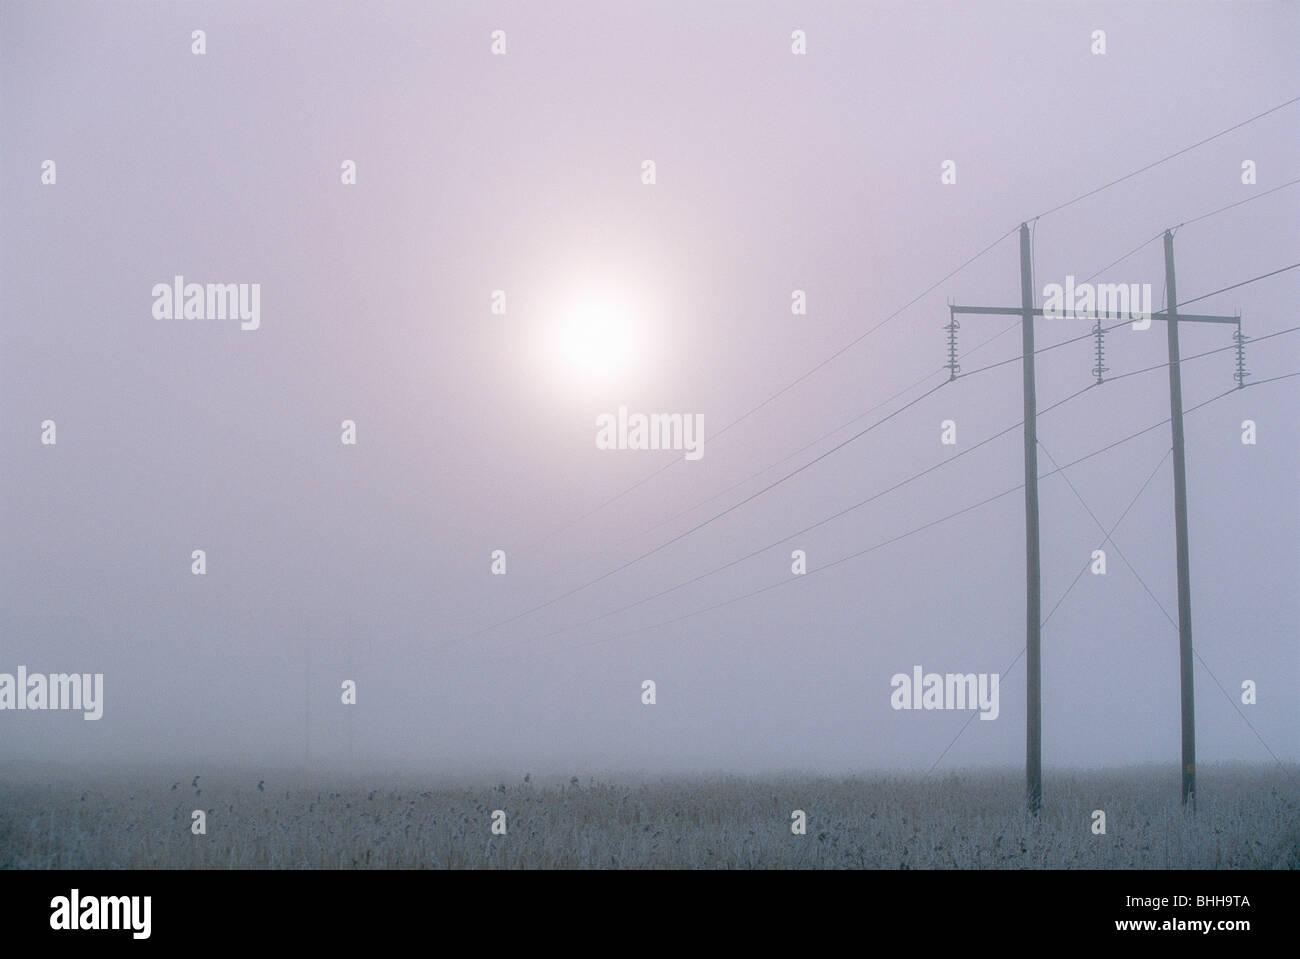 Power line against a foggy sky, Sweden. - Stock Image